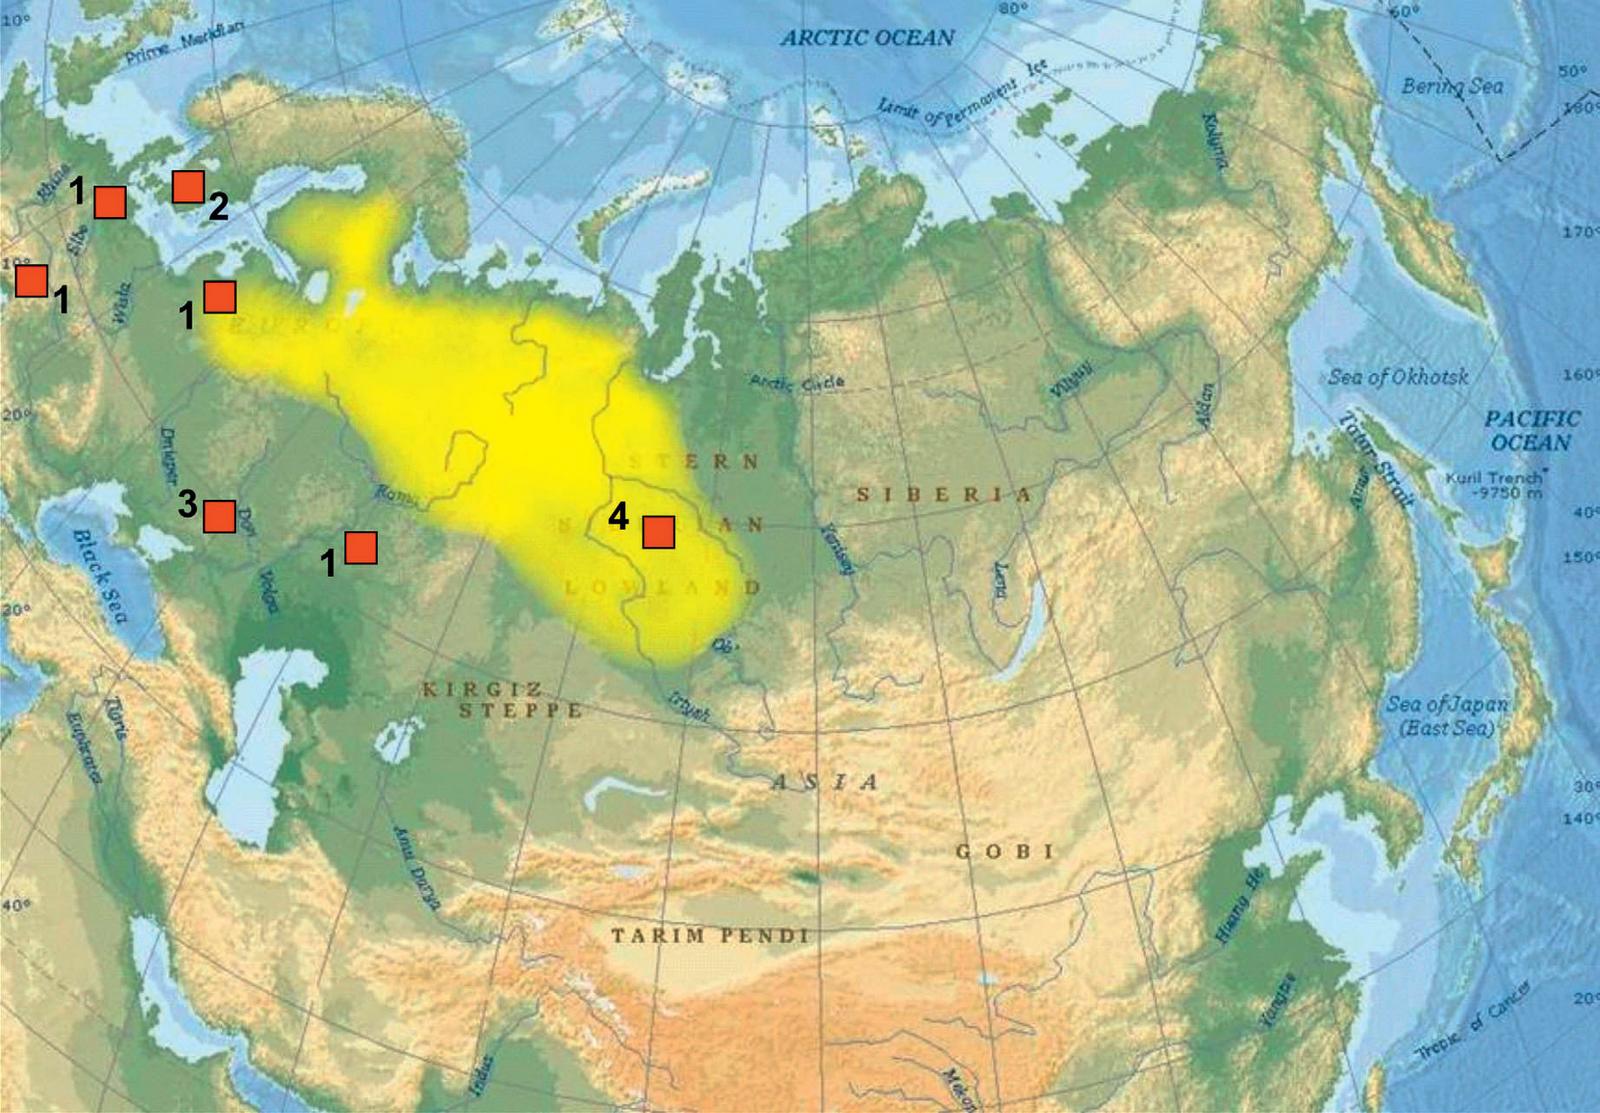 The careful examination of the West Siberian Plain Map